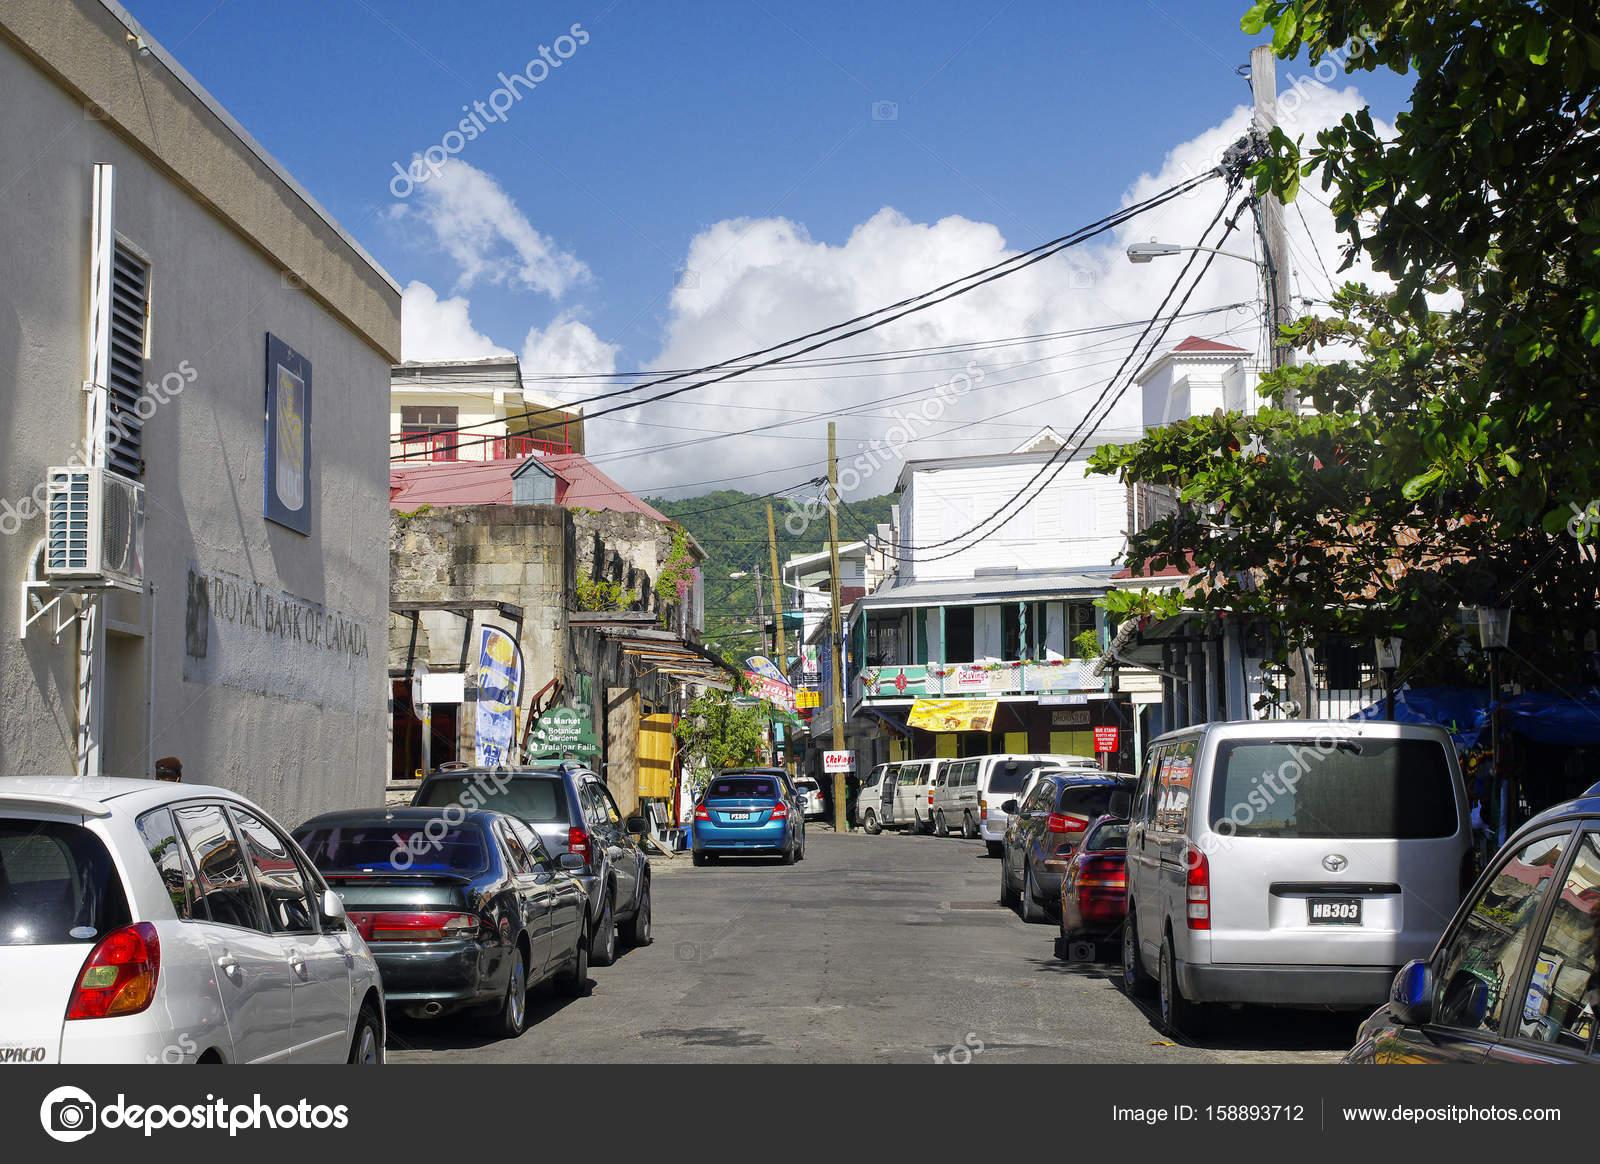 roseau dominica january 5 2017 people visit the old roseau